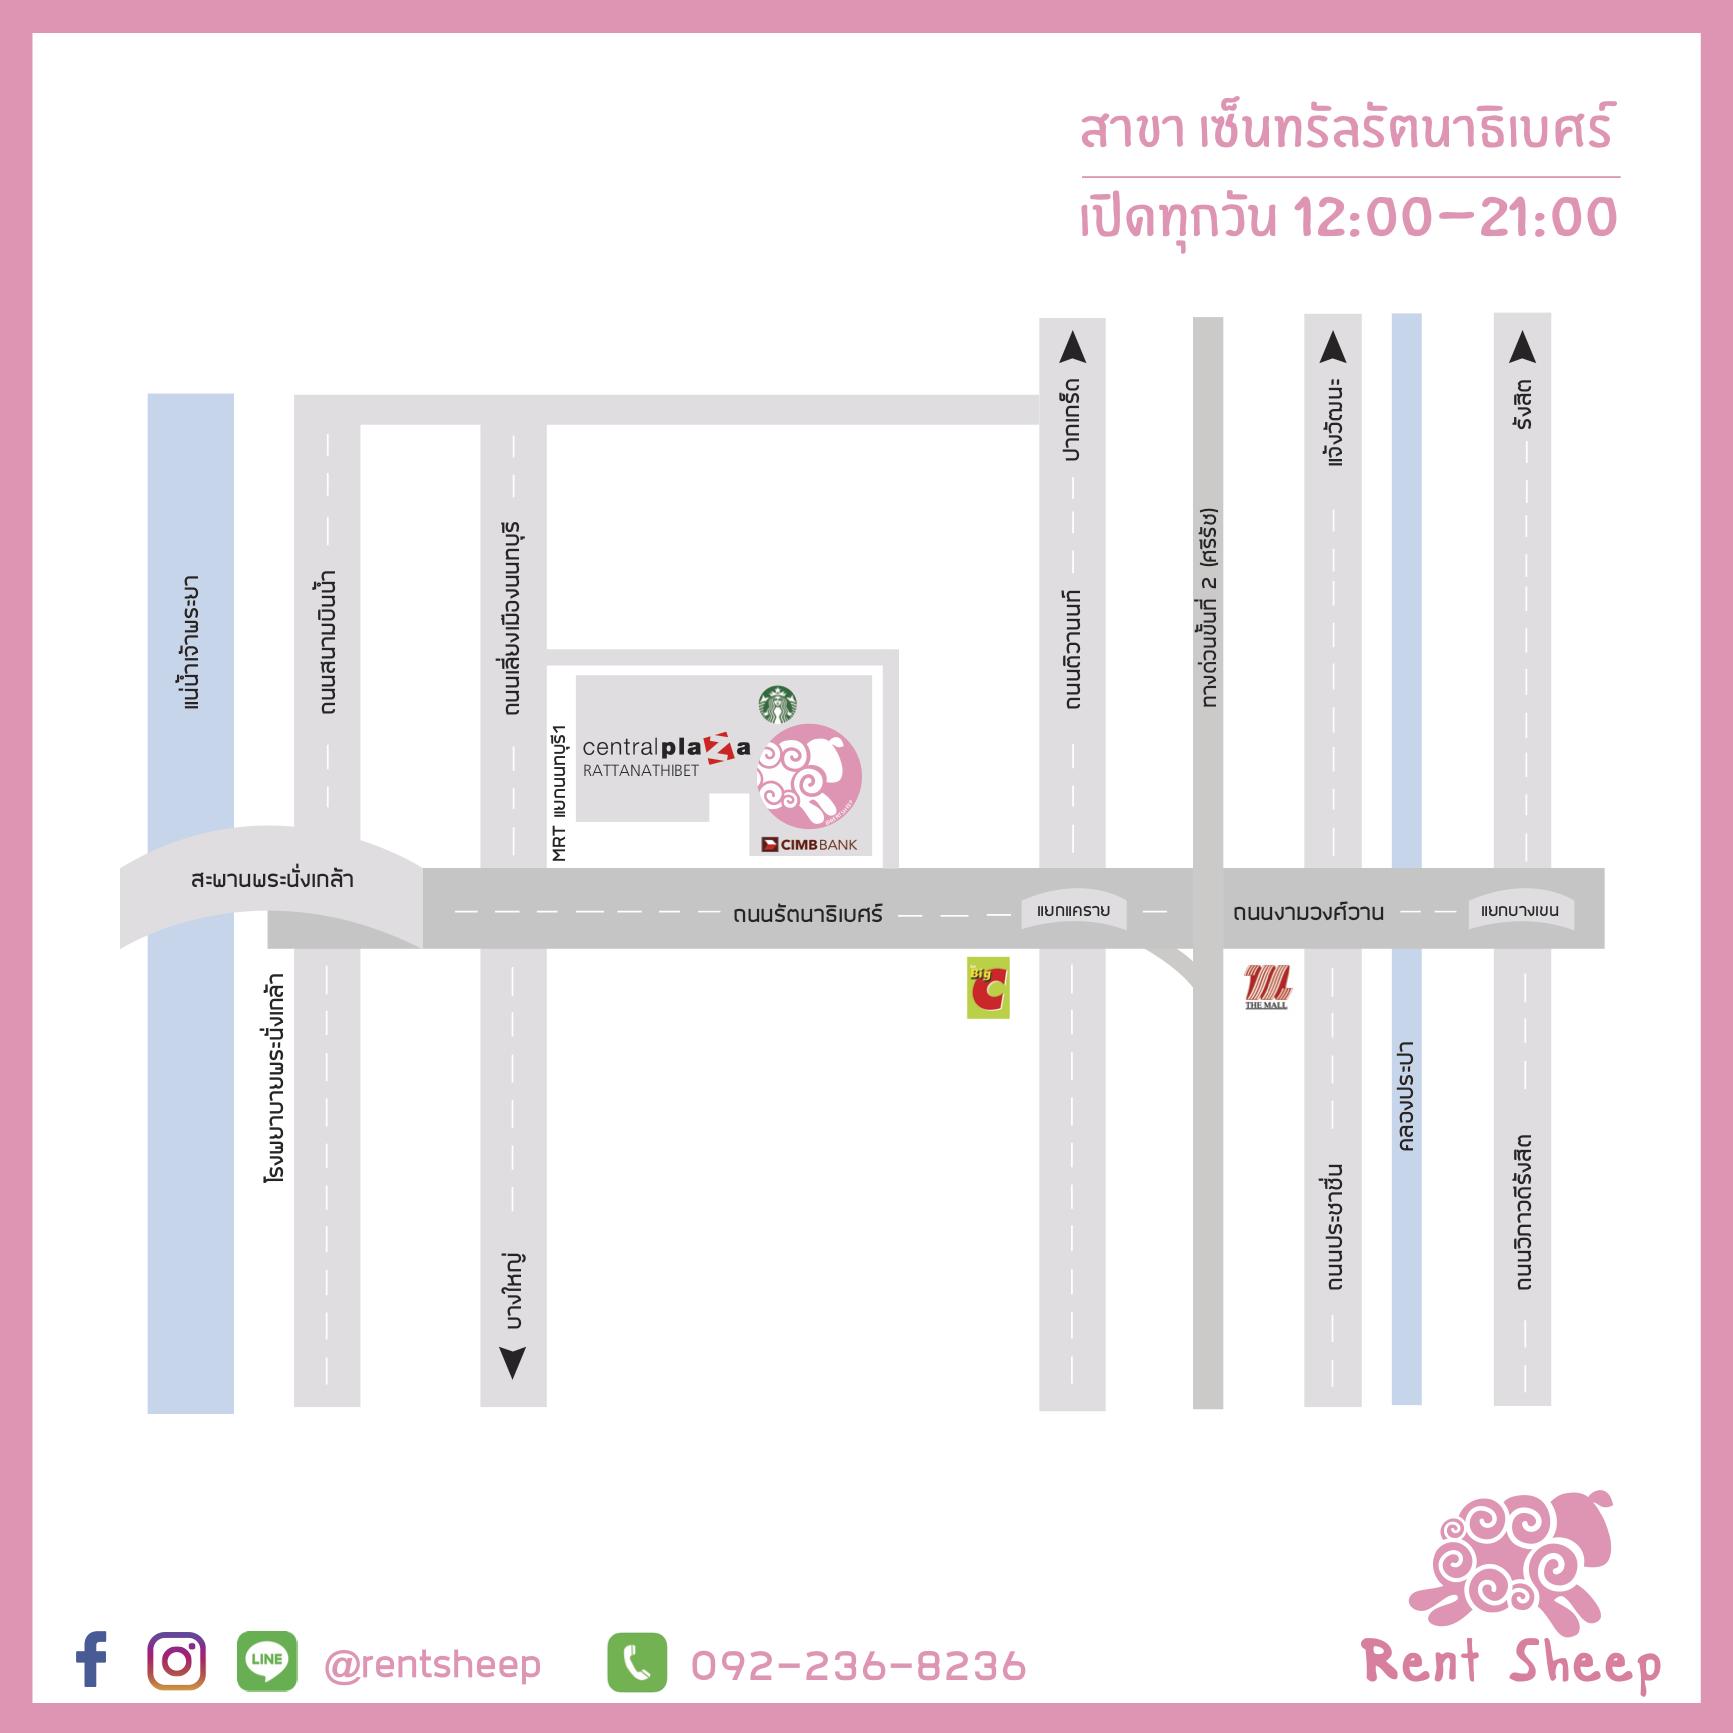 http://map-RAT-นนทบุรี-รัตนาธิเบศร์-rentsheep